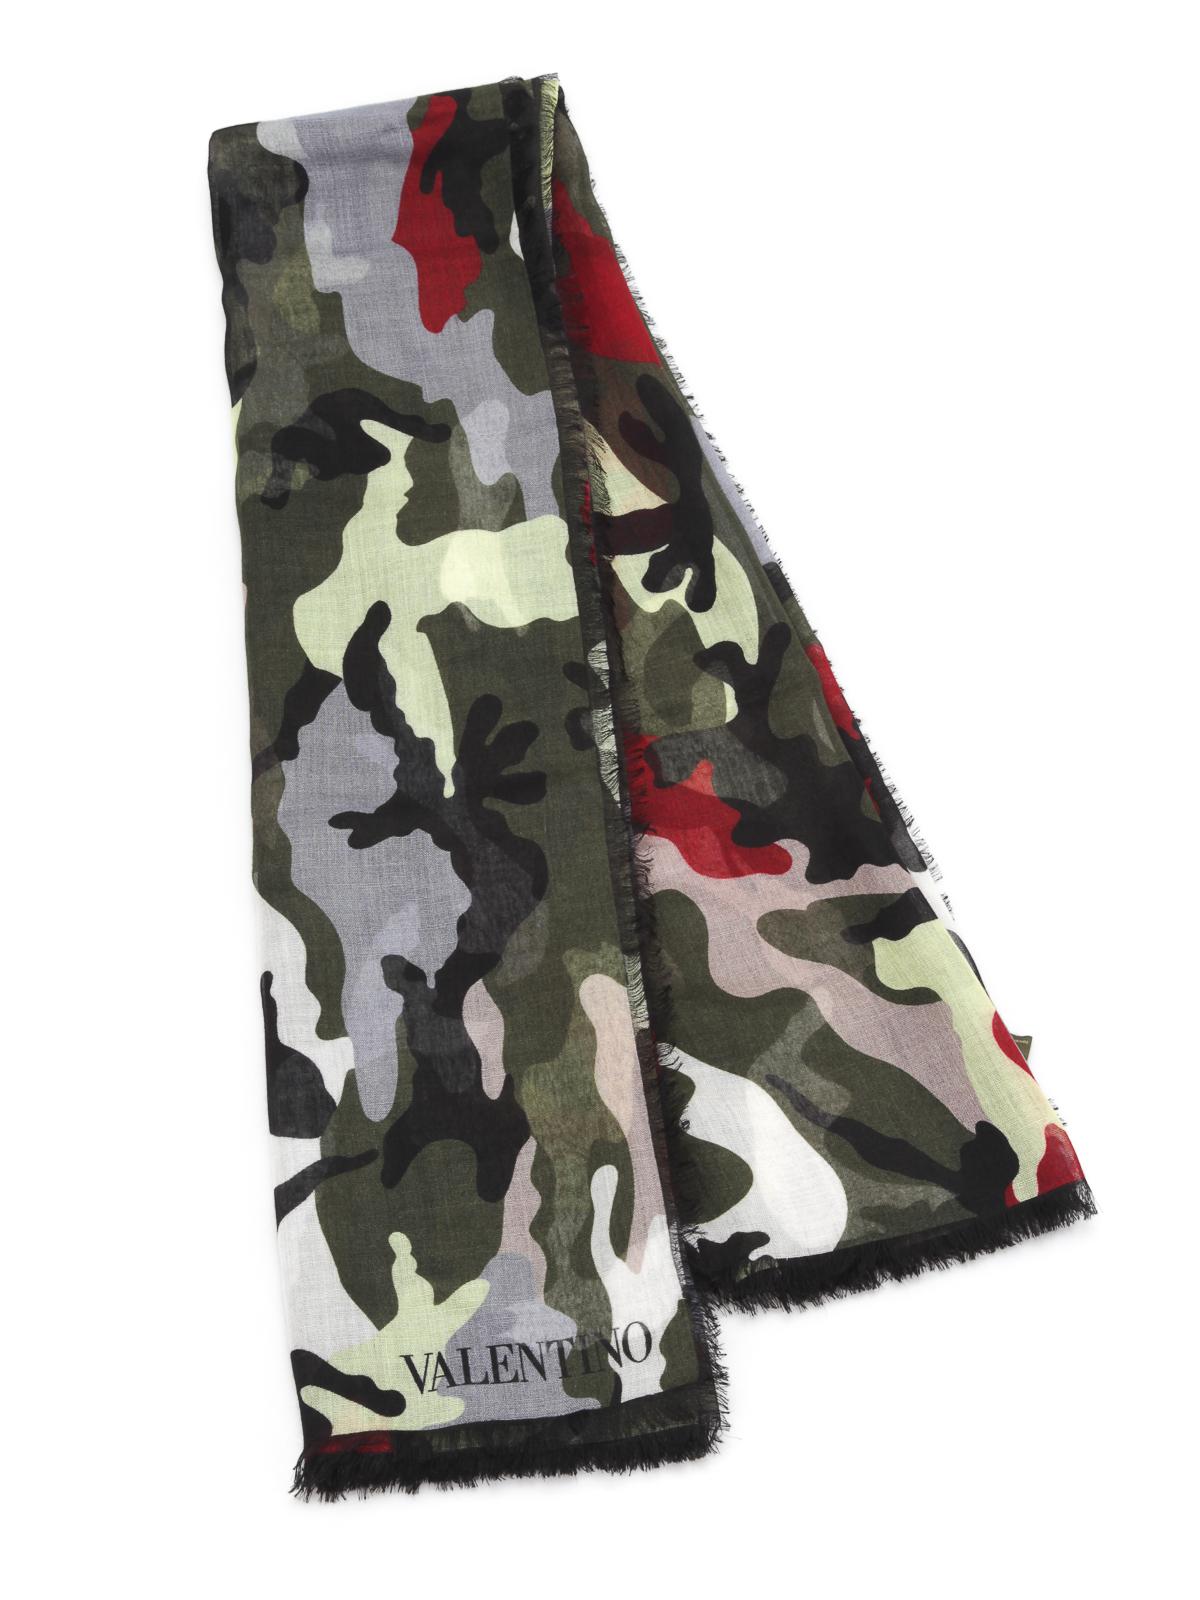 63657fe3dc7 Valentino - Camouflage scarf - scarves - JU0EB002WCC 825 | iKRIX.com